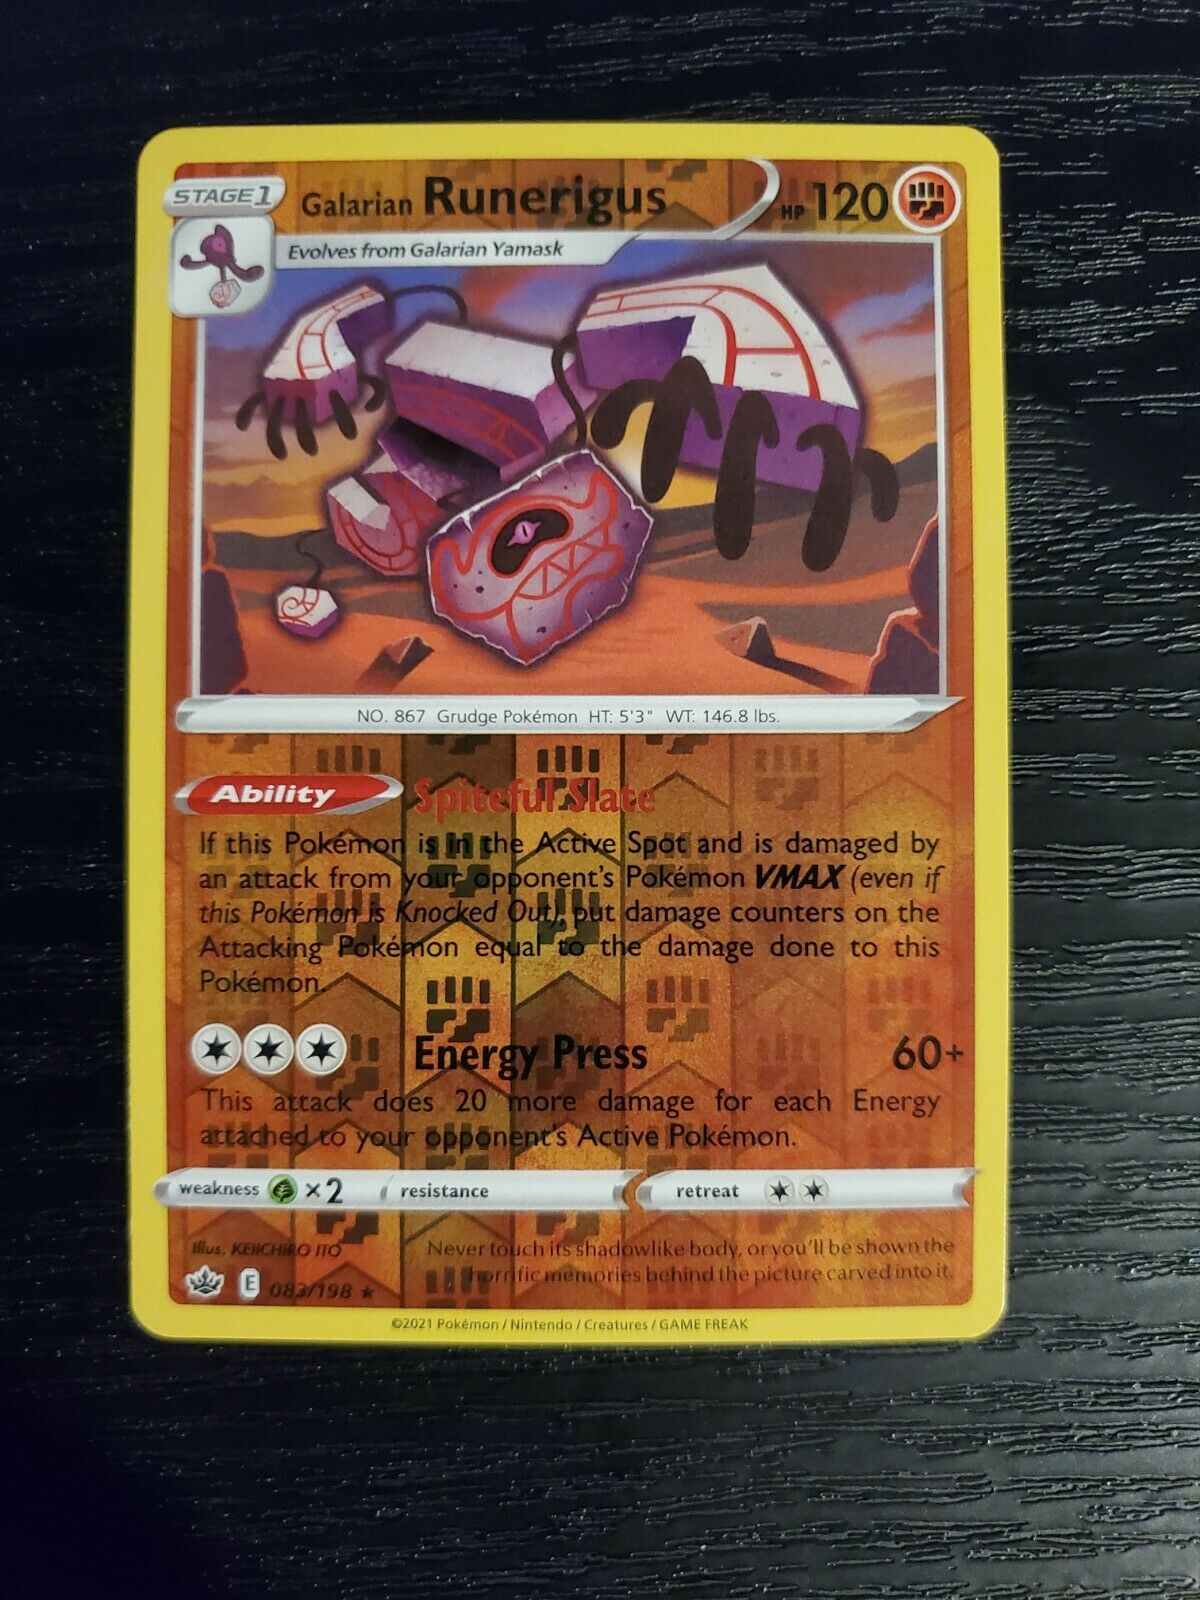 Galarian Runerigus 083/198 Chilling Reign Reverse Holo Rare Pokemon Card NM